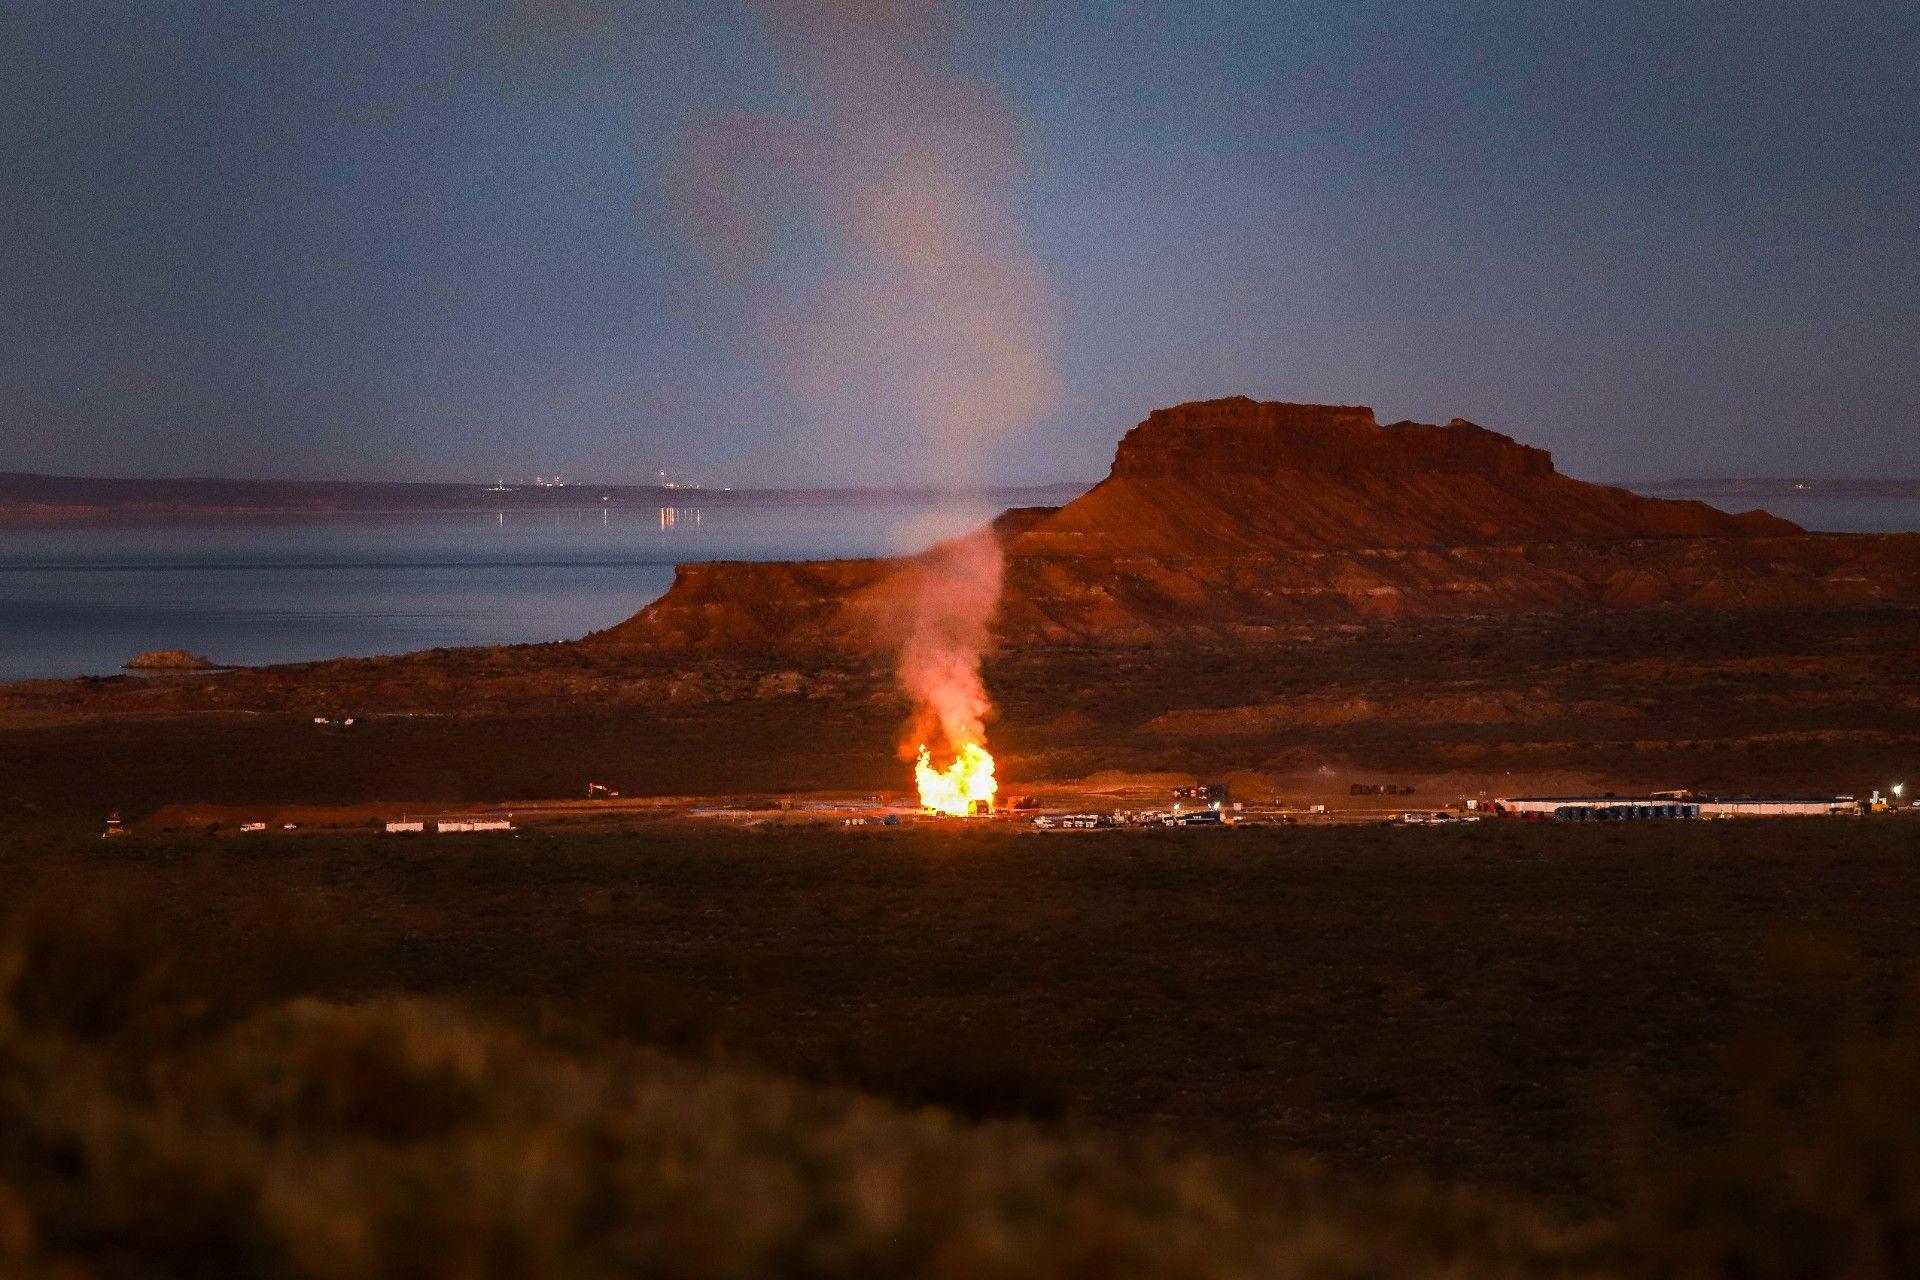 Incendio en pozo Loma La Lata Oeste. Foto, Juan Pablo Barrientos